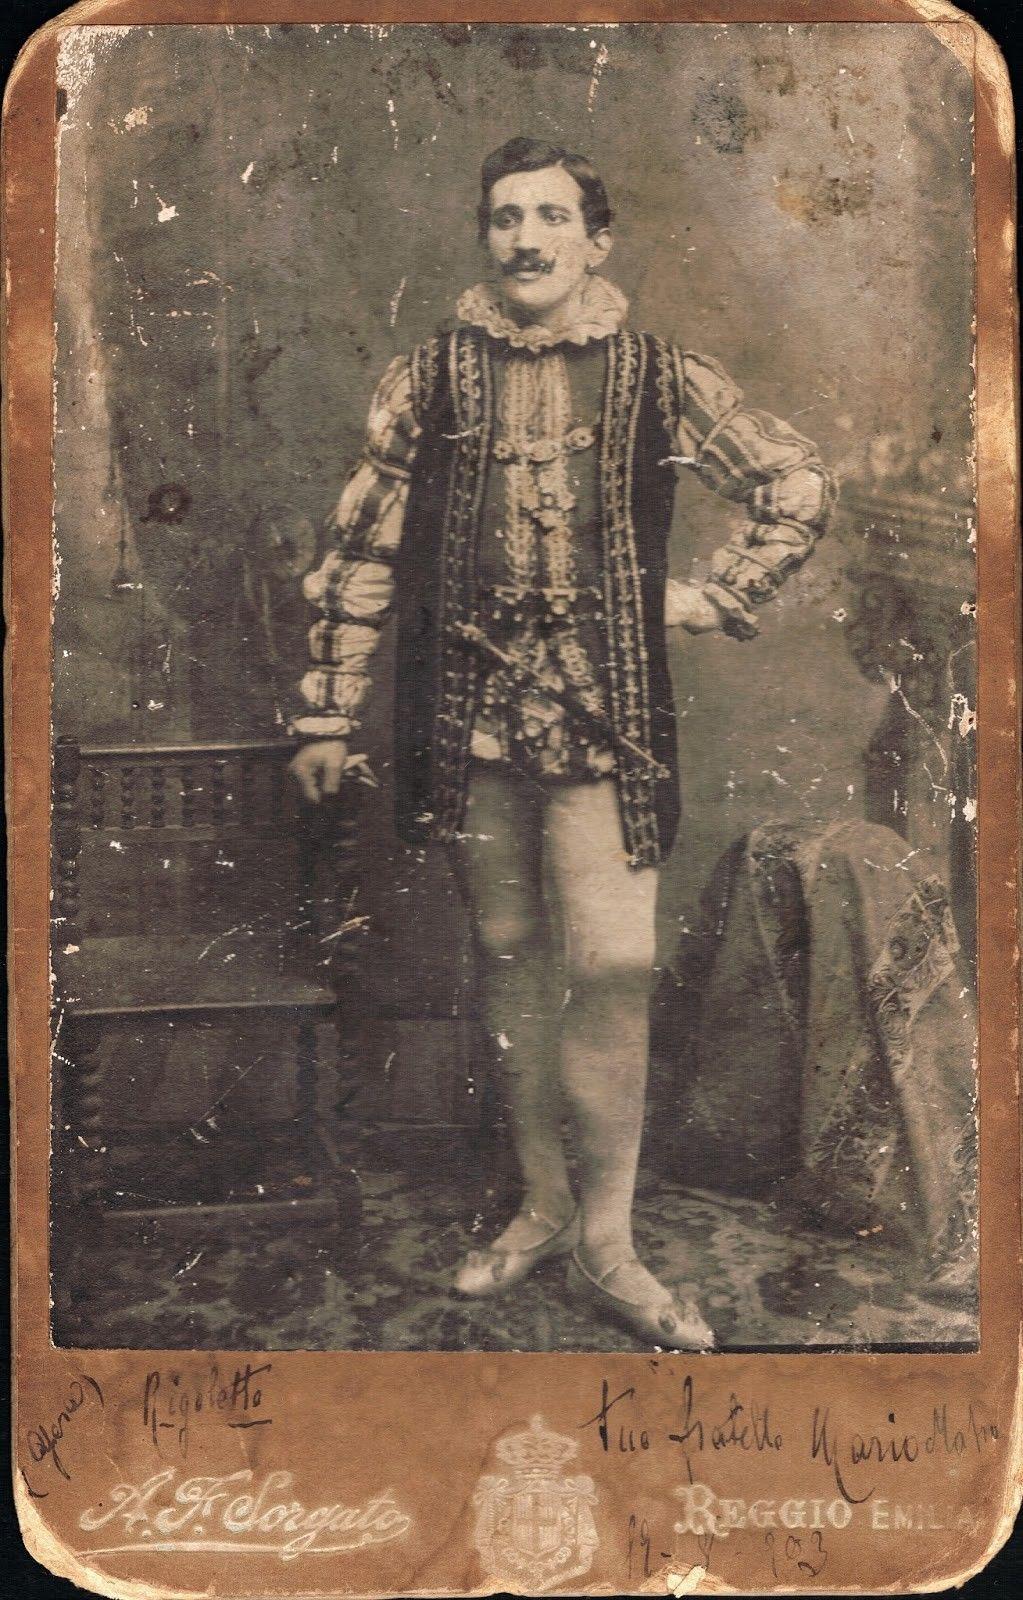 ITALIAN TENOR MARIO MATROIANI (MATROJANI) CD